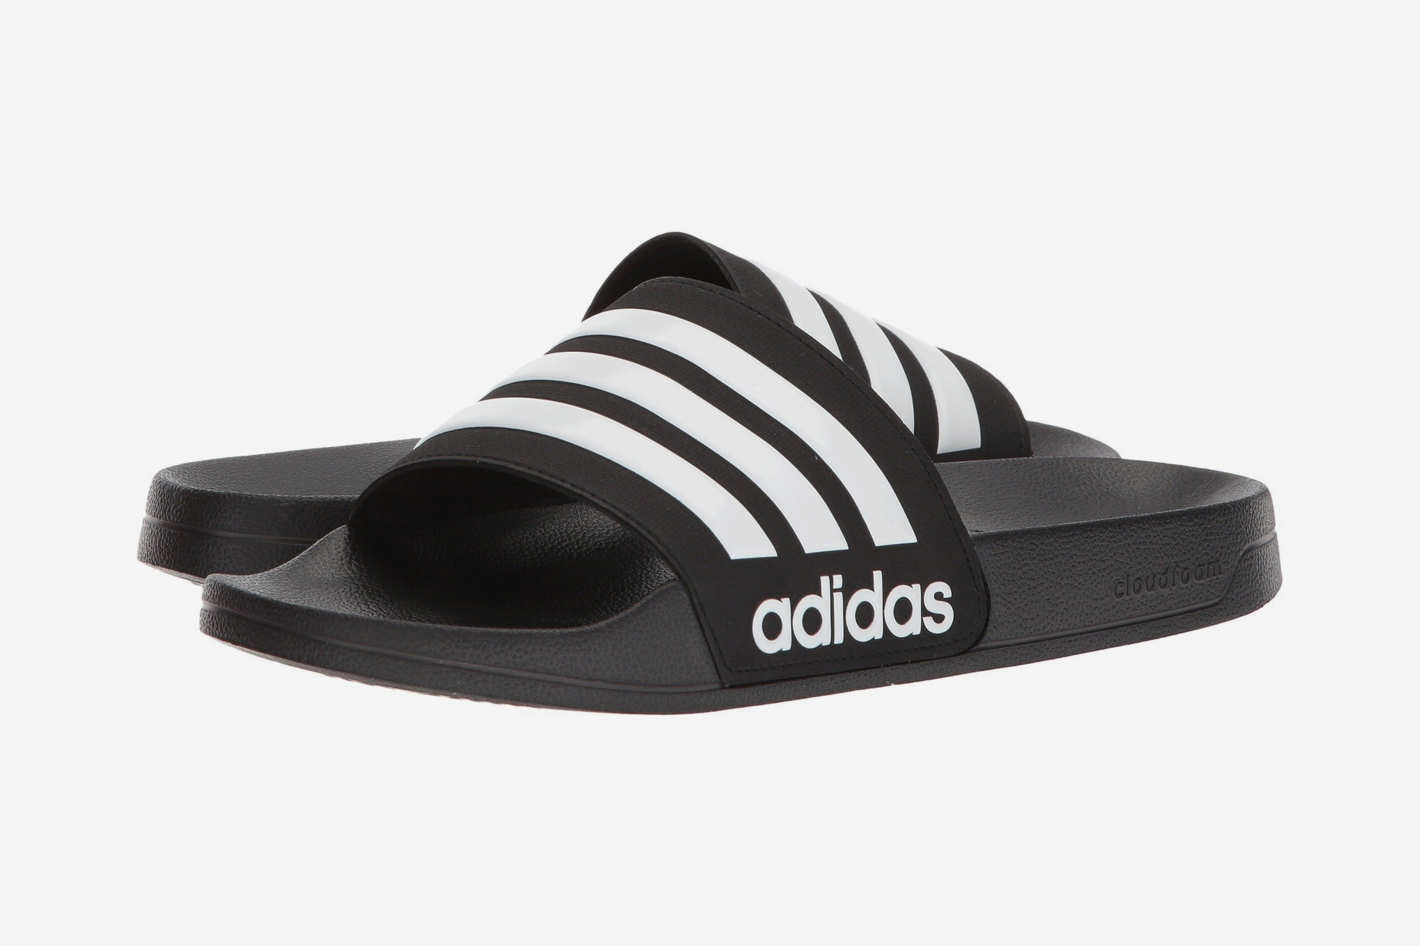 Adidas Adilette CF+